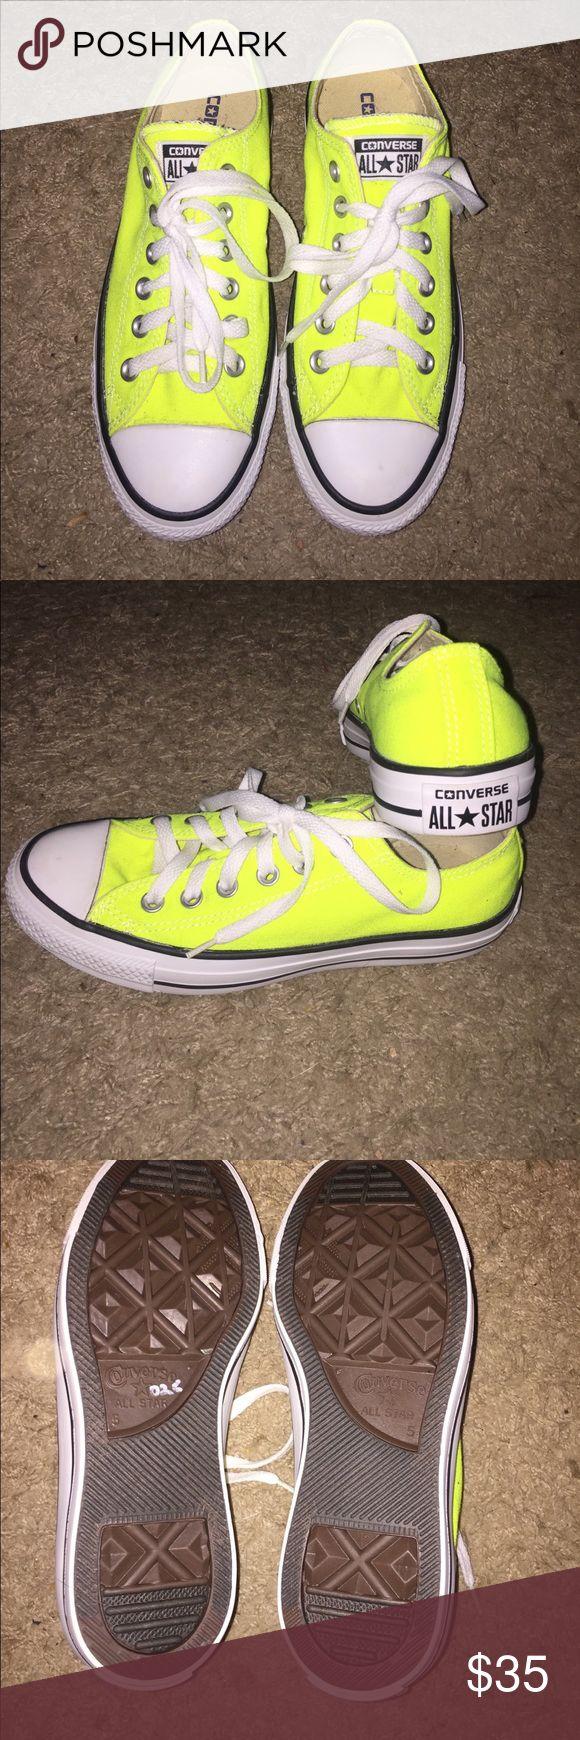 Neon Yellow All Star Converse UNWORN neon, highlighter yellow All Star Converse!! Size 5 in Men's, Size 7 in Women's Converse Shoes Sneakers